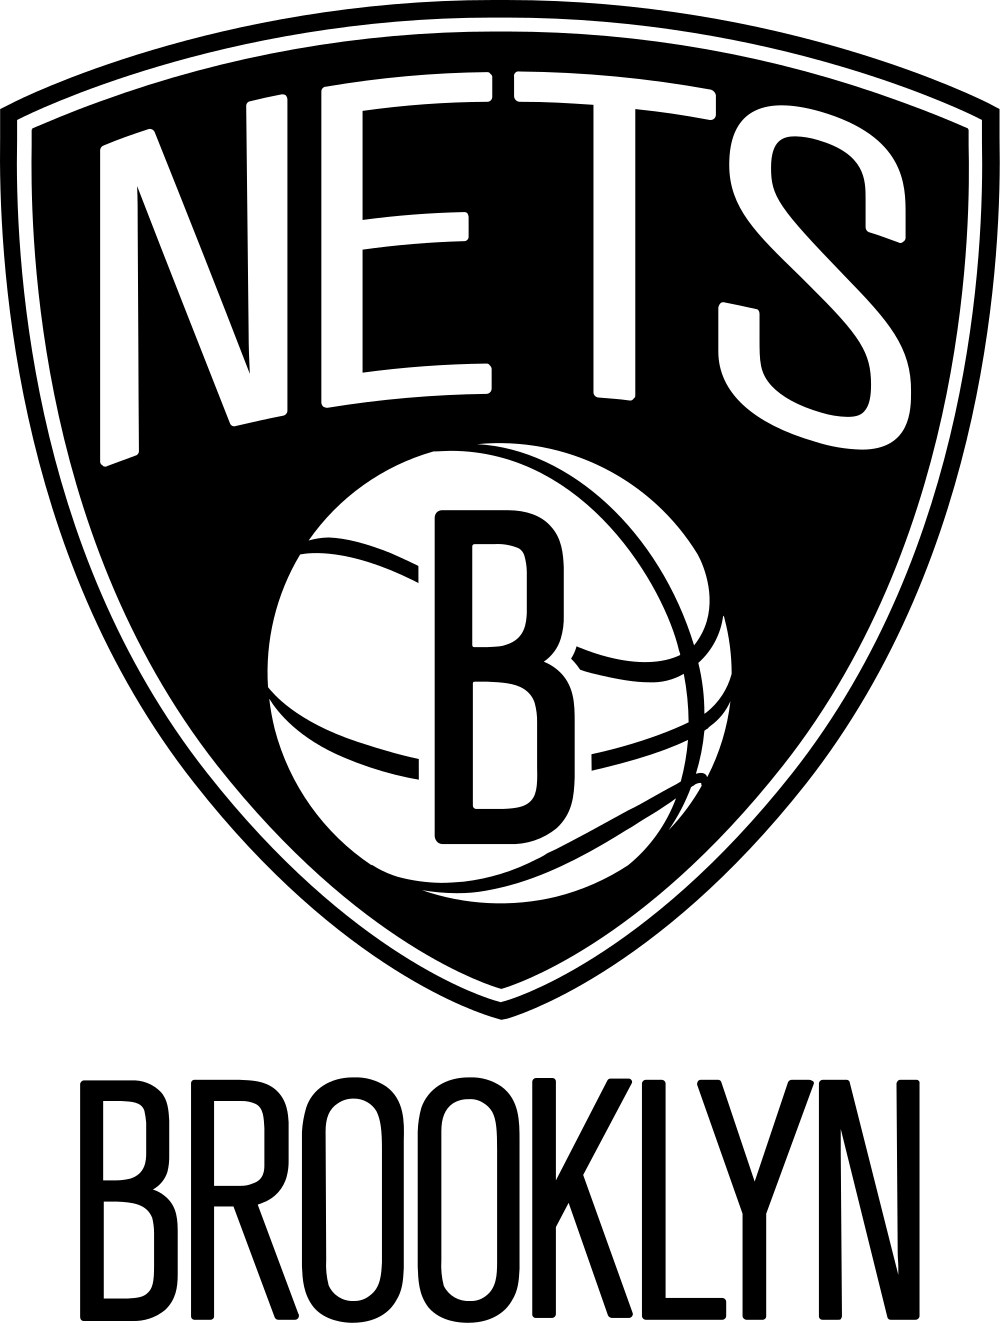 Open Hdpng.com  - Brooklyn Nets, Transparent background PNG HD thumbnail